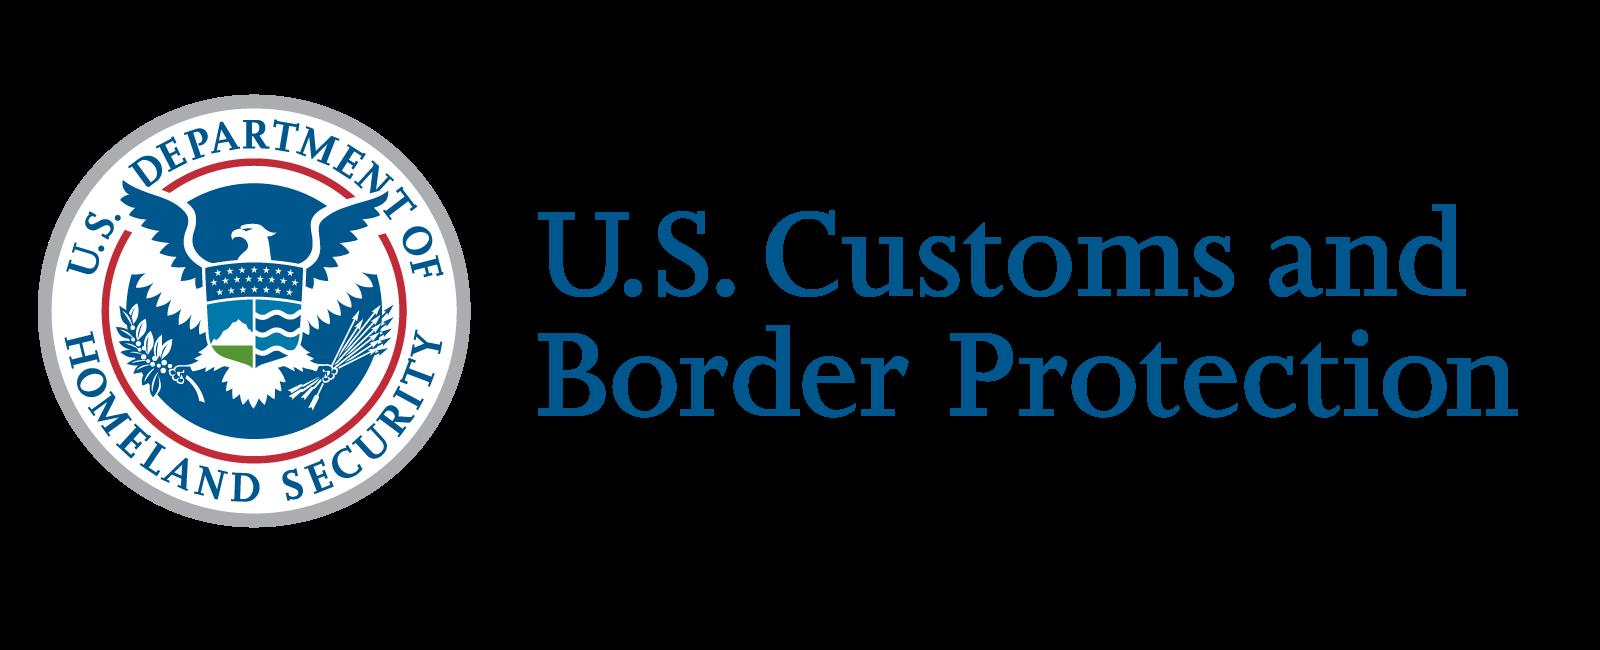 CBP Extends Closure of Trusted Traveler Programs Enrollment Centers to September 8 - Eagle Pass Business Journal